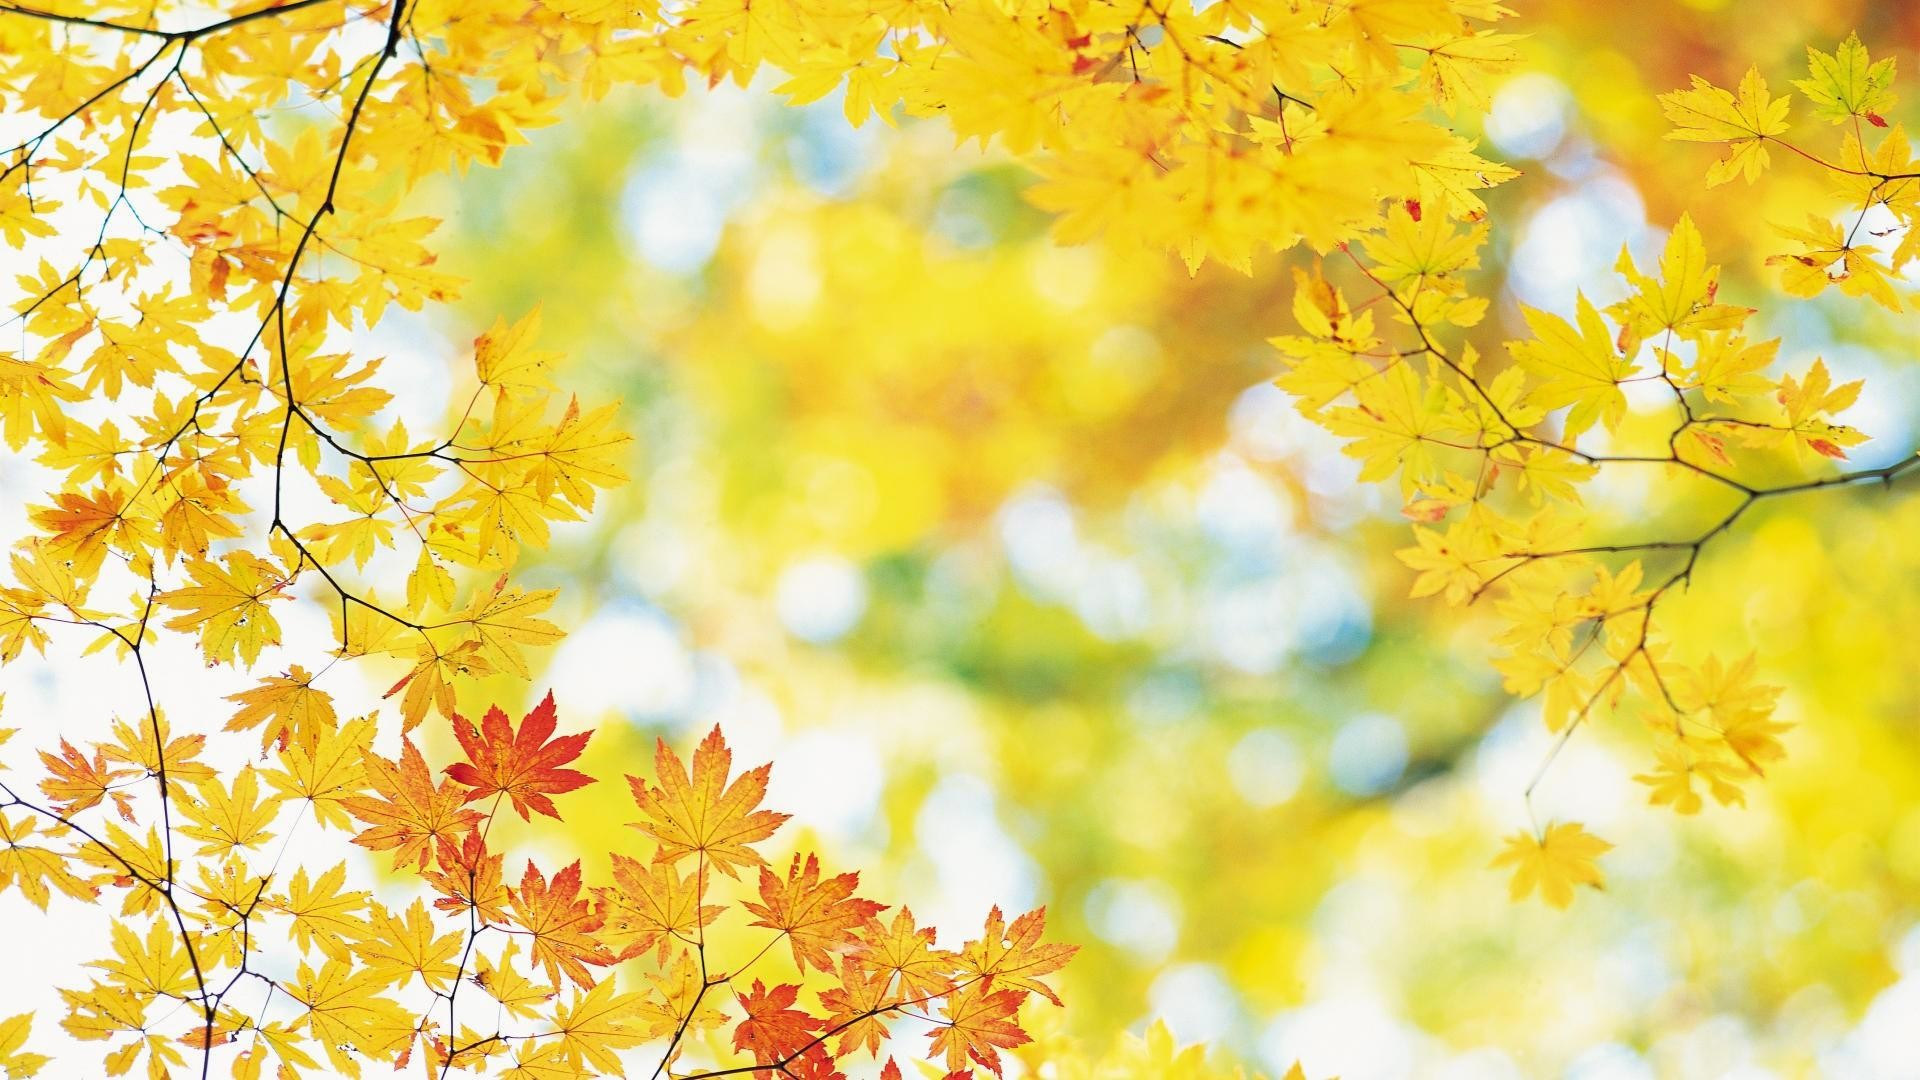 Fall-leaves-desktop-hd-wallpapers